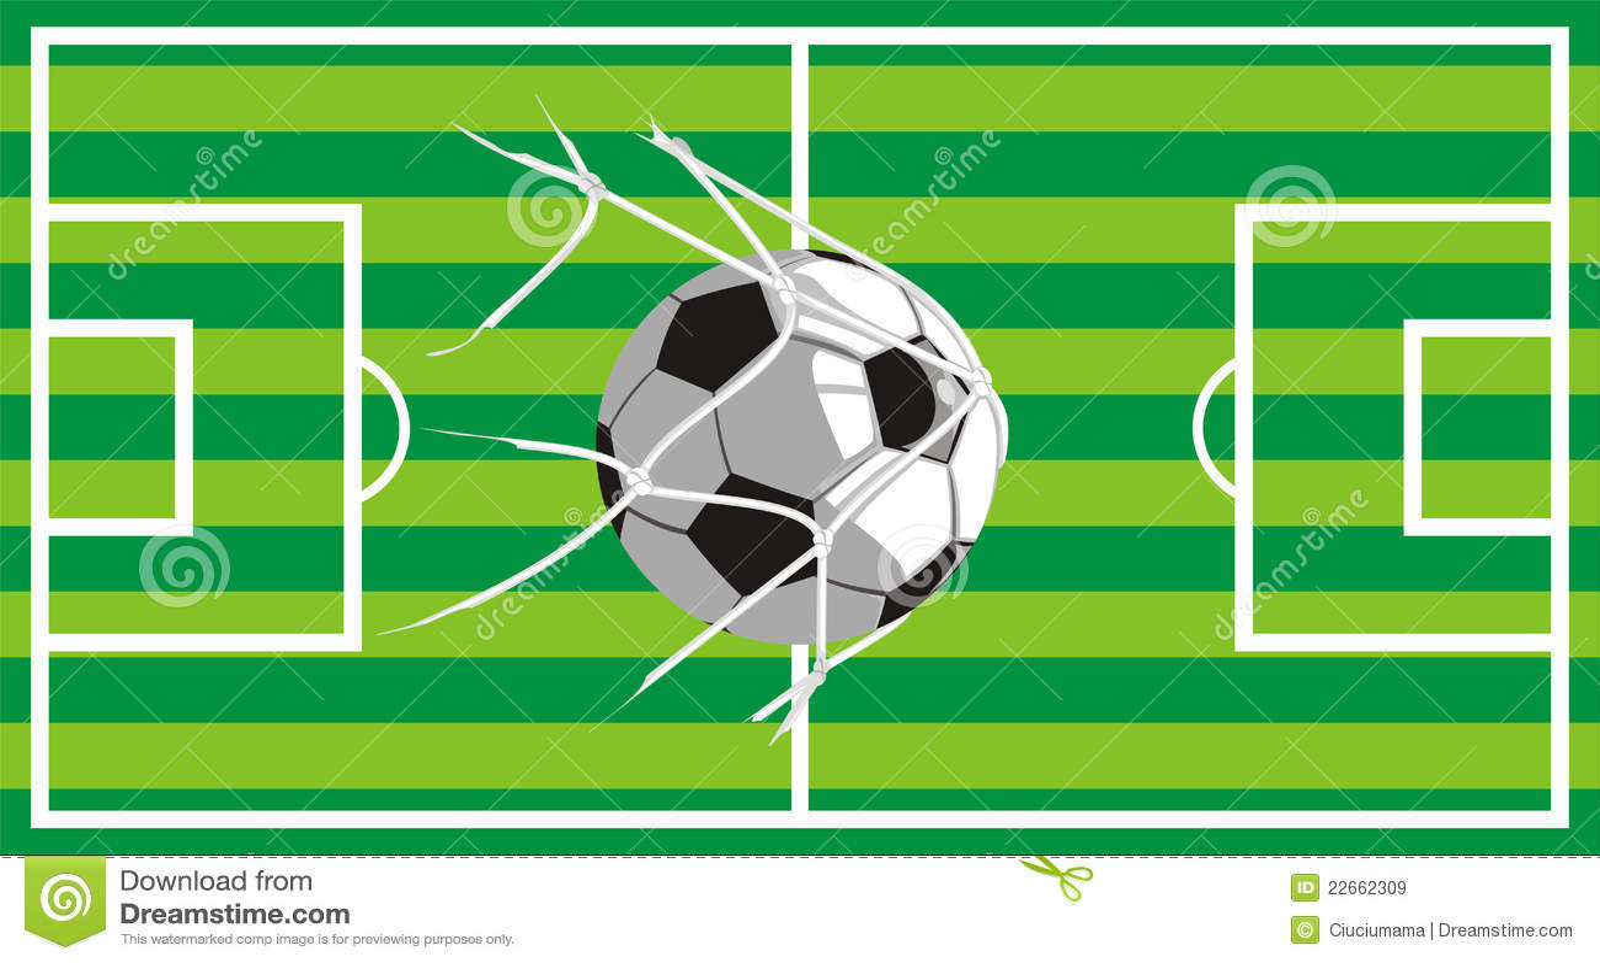 Football Field - Shot On Target Stock Vector - Illustration